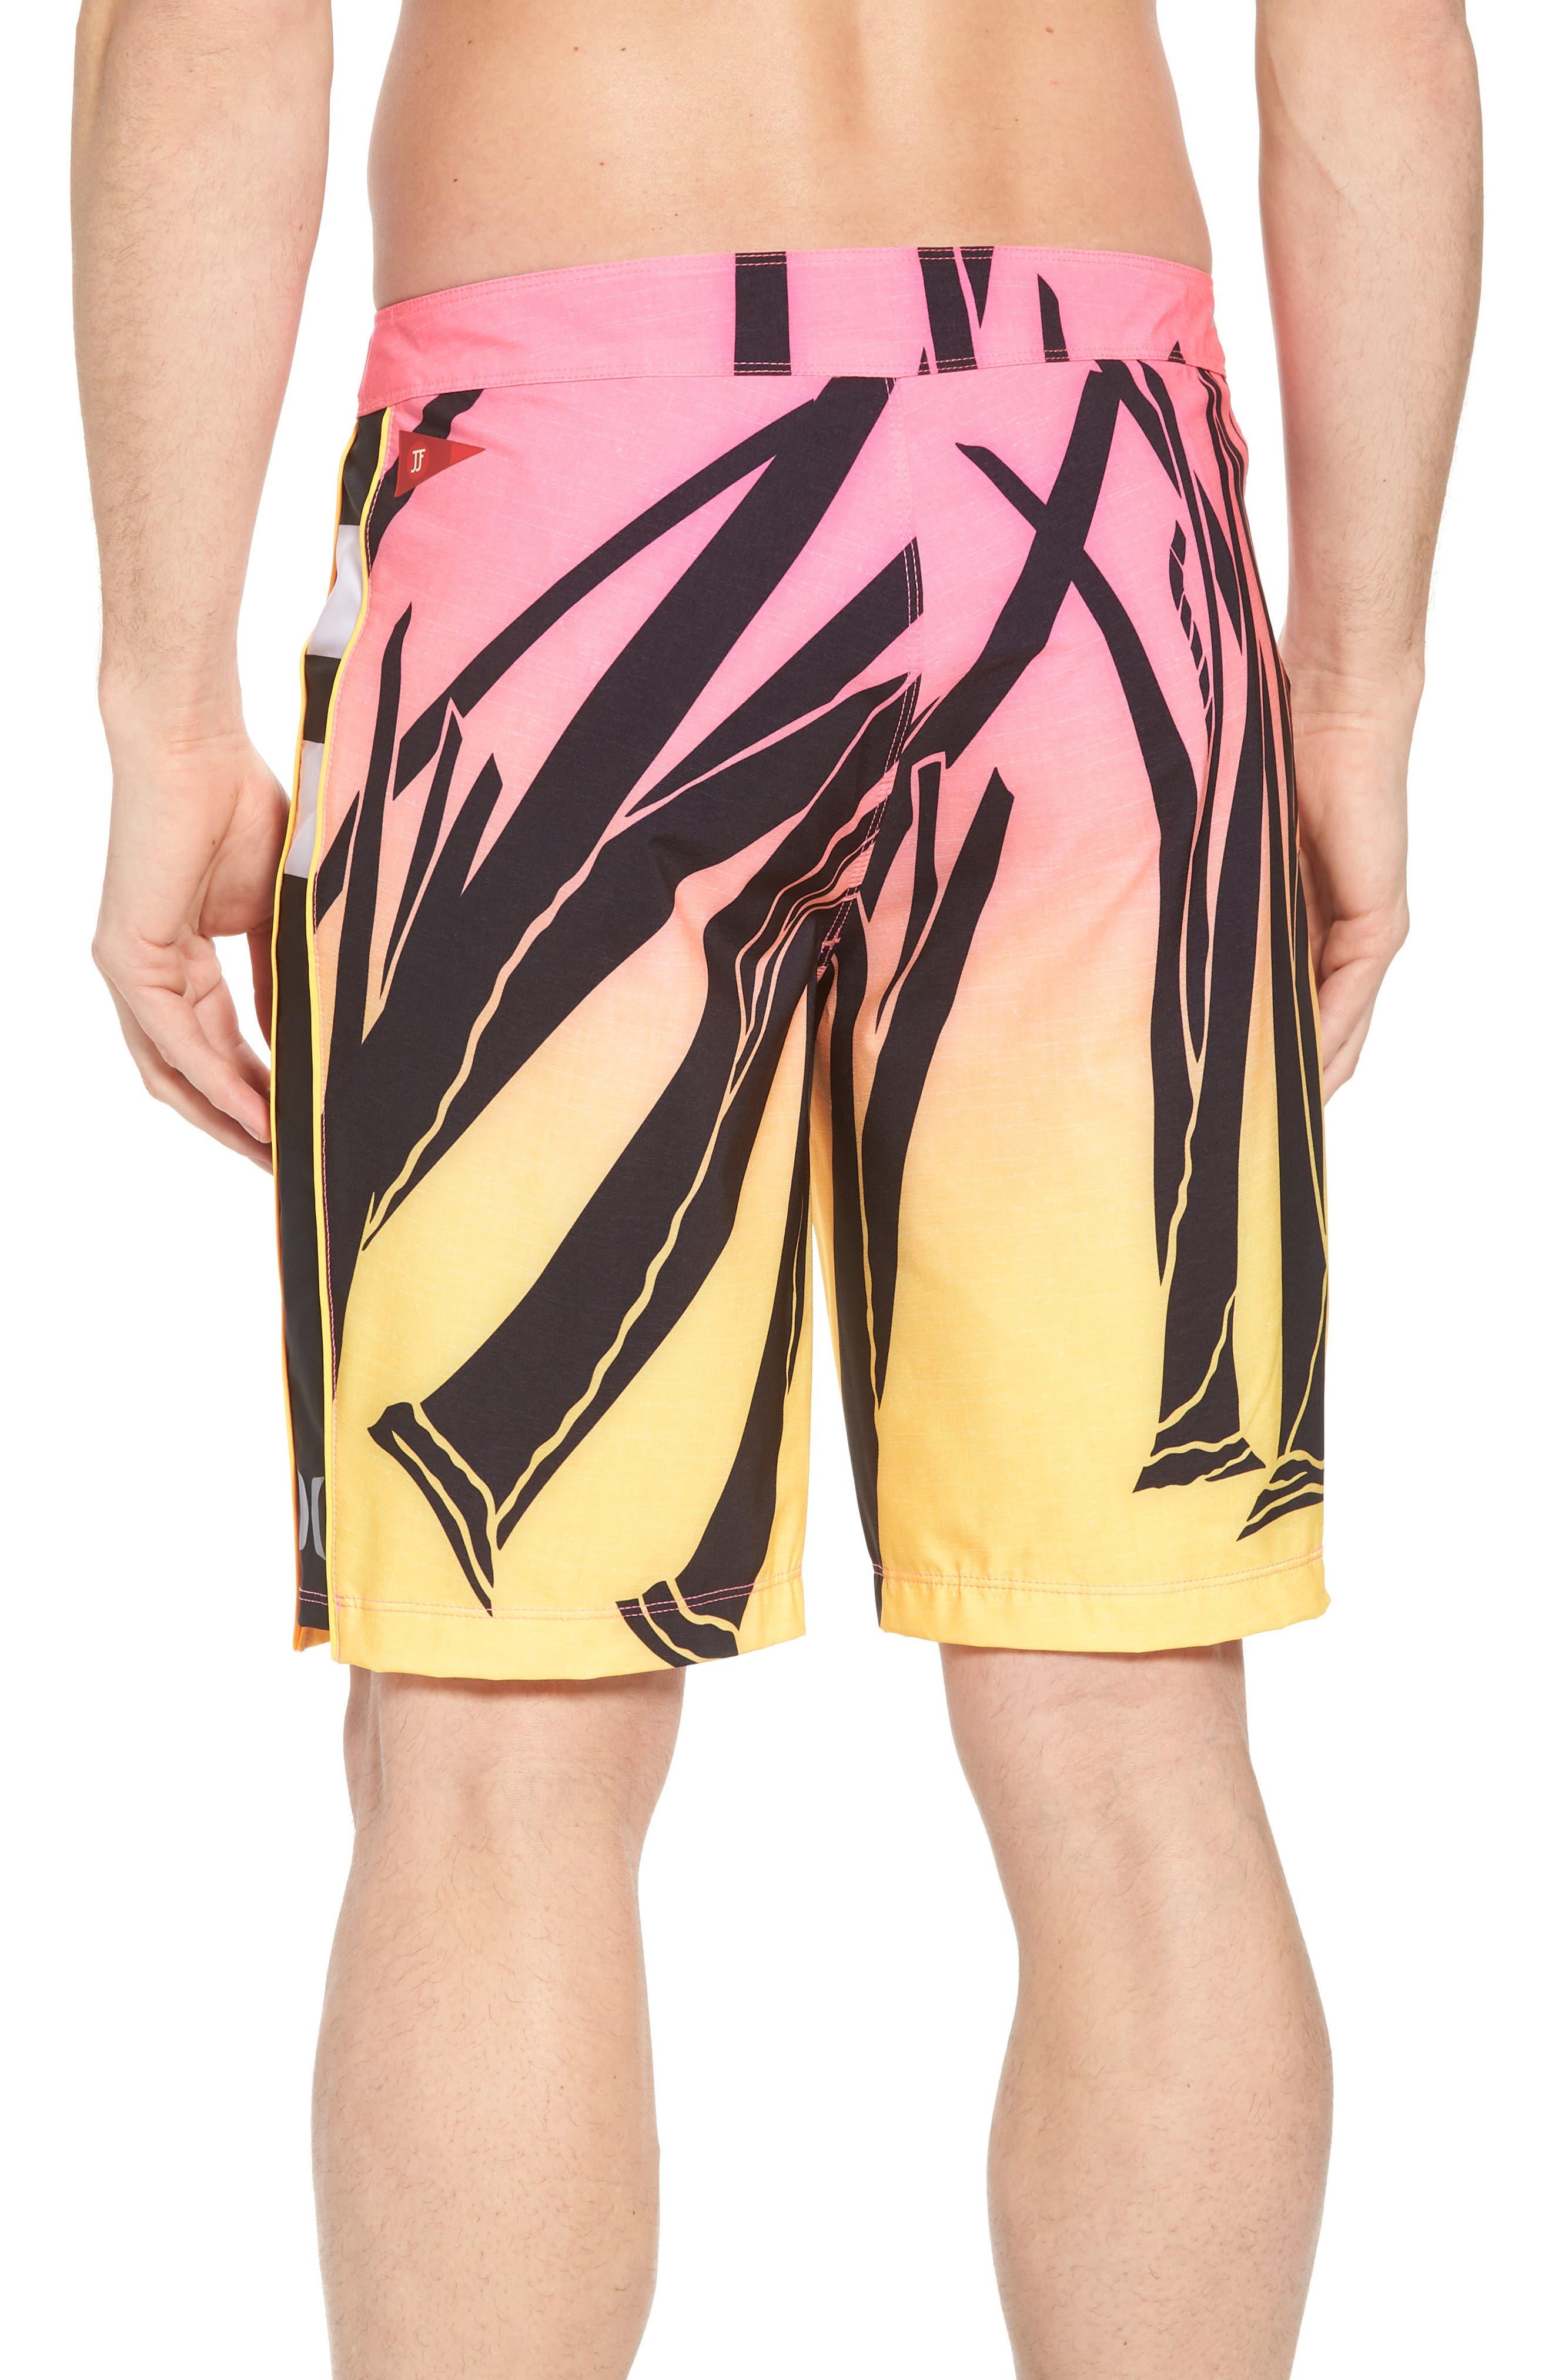 JJF IV Kahuliwae Board Shorts,                             Alternate thumbnail 2, color,                             Hyper Pink